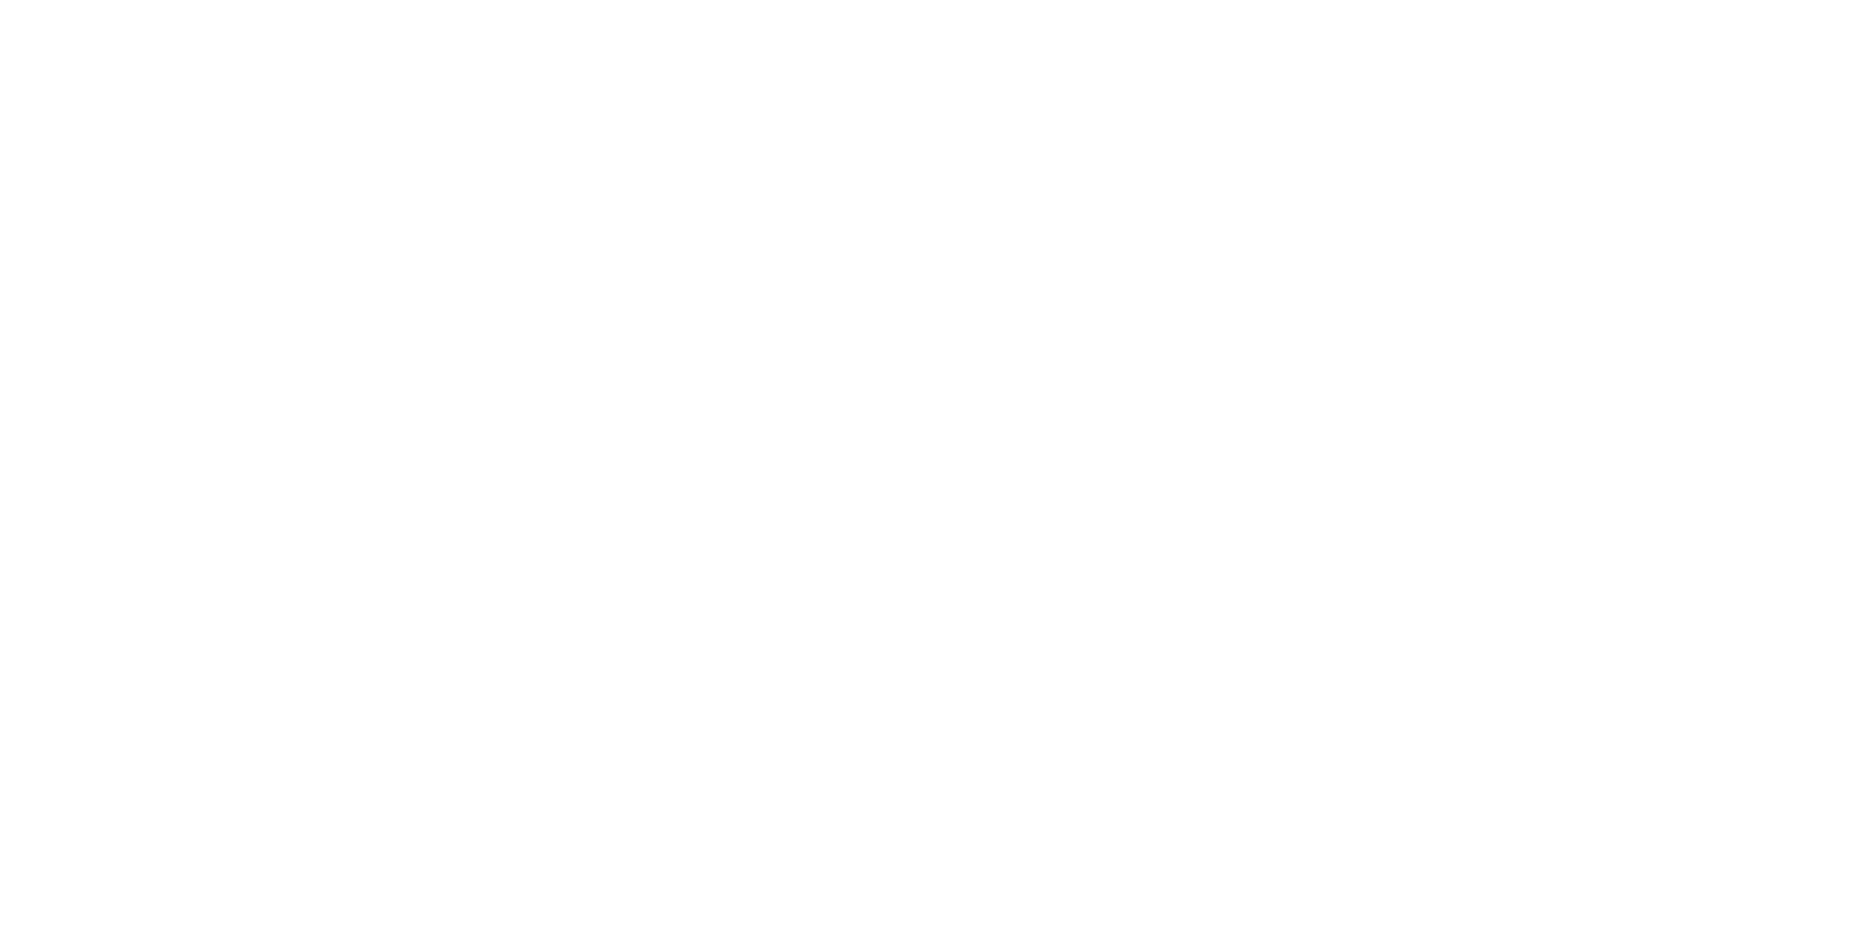 logo-design-101